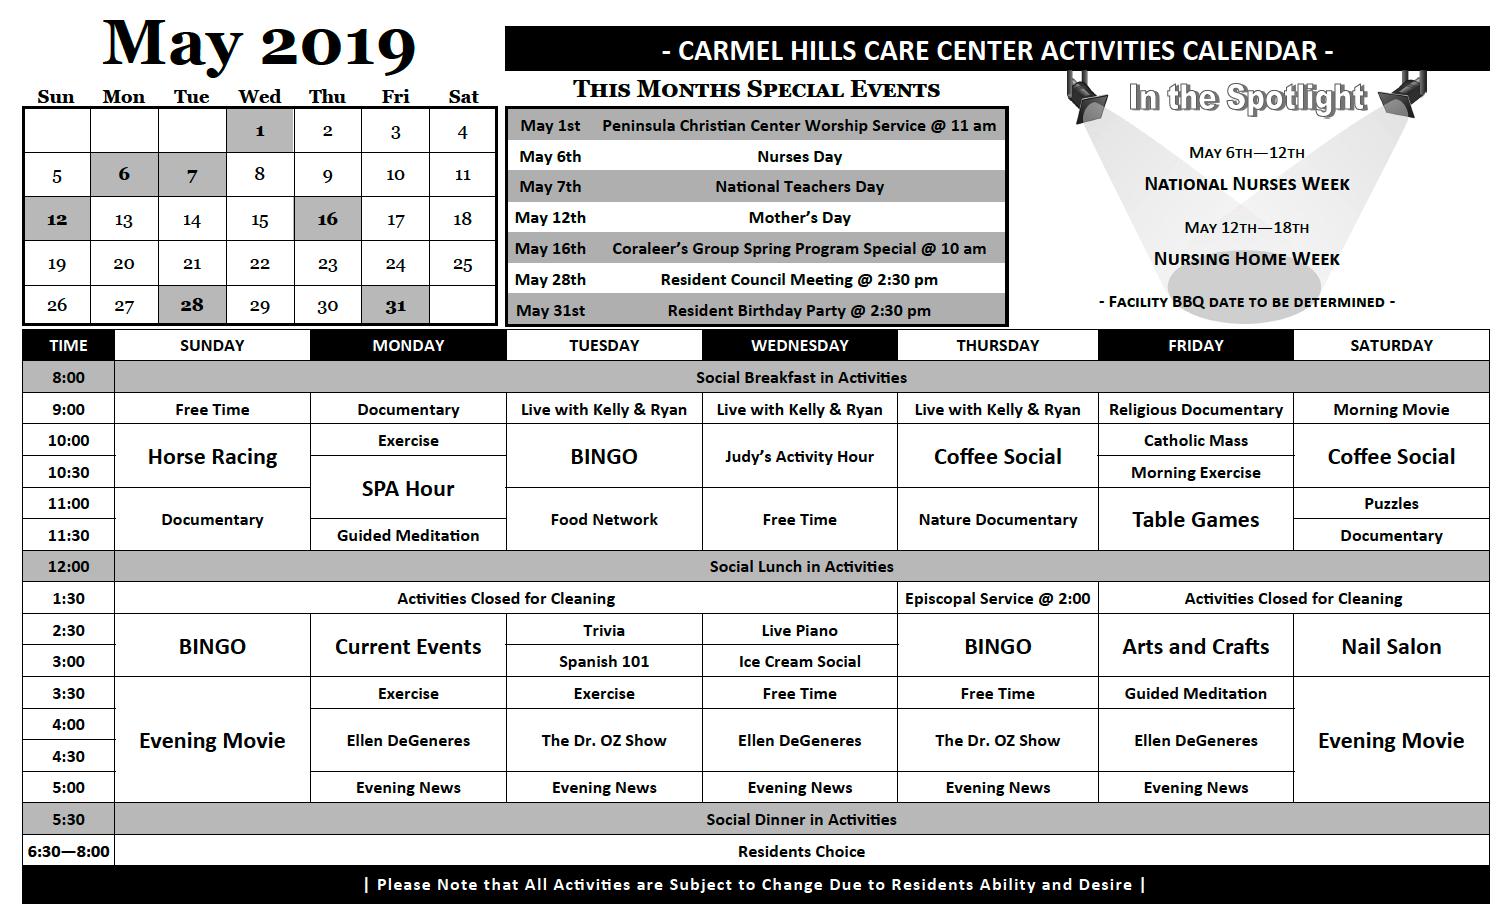 May 2019 resident activity calendar